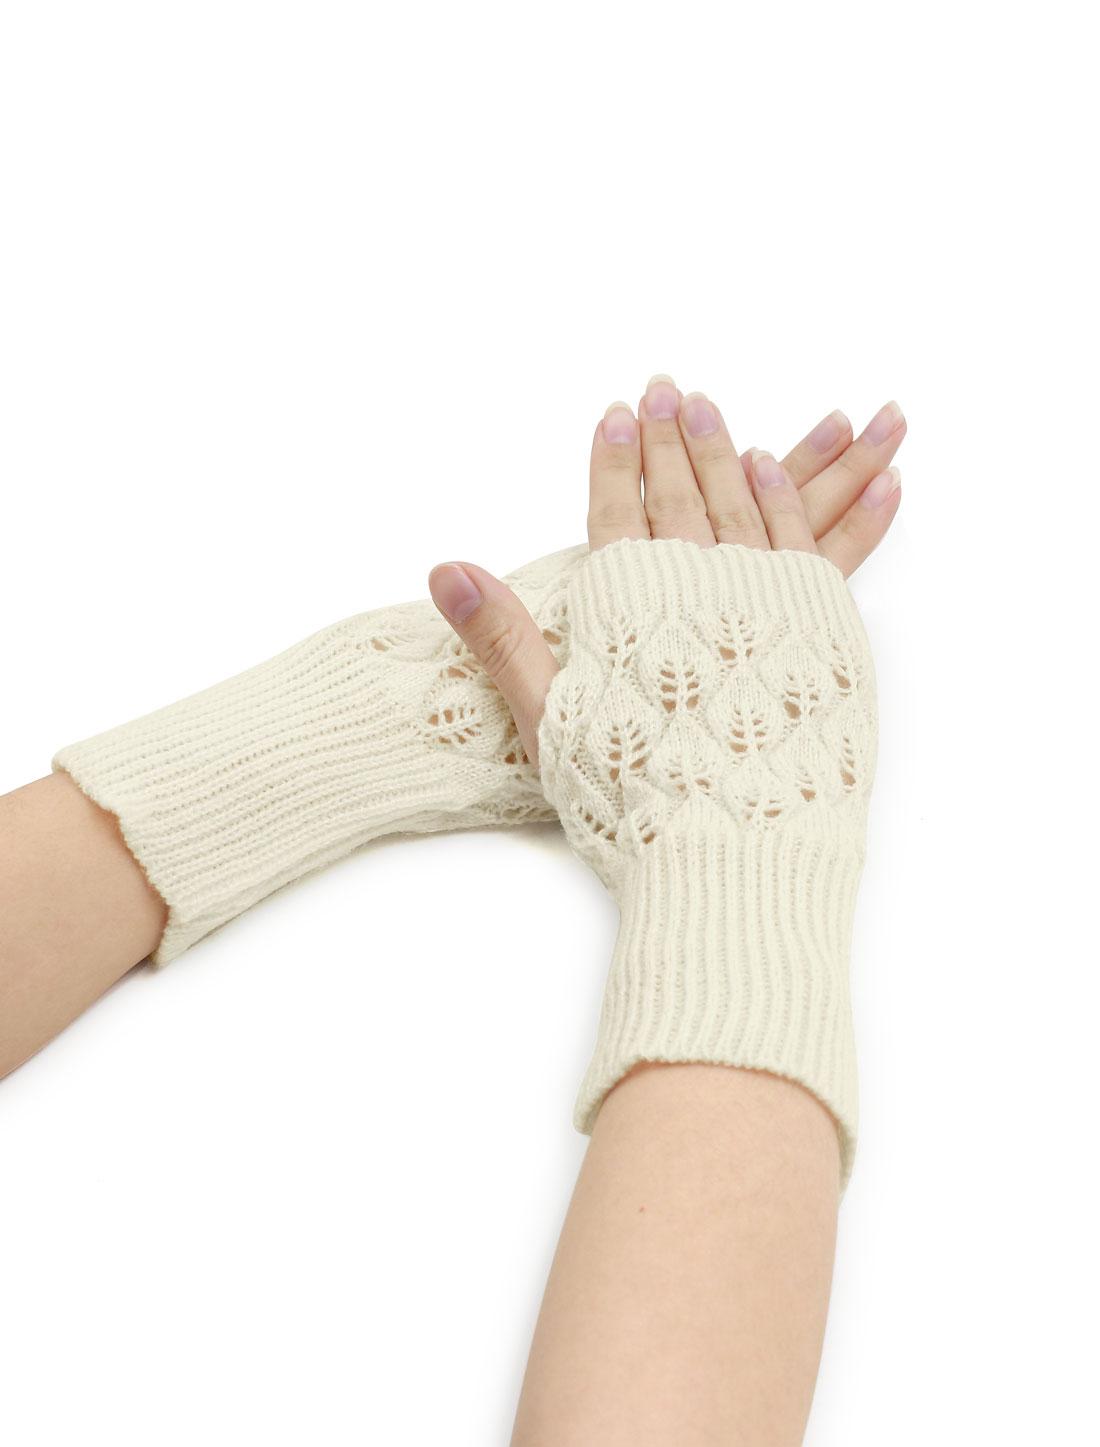 Women Wrist Length Leaves Design Knit Arm Warmers Pair White